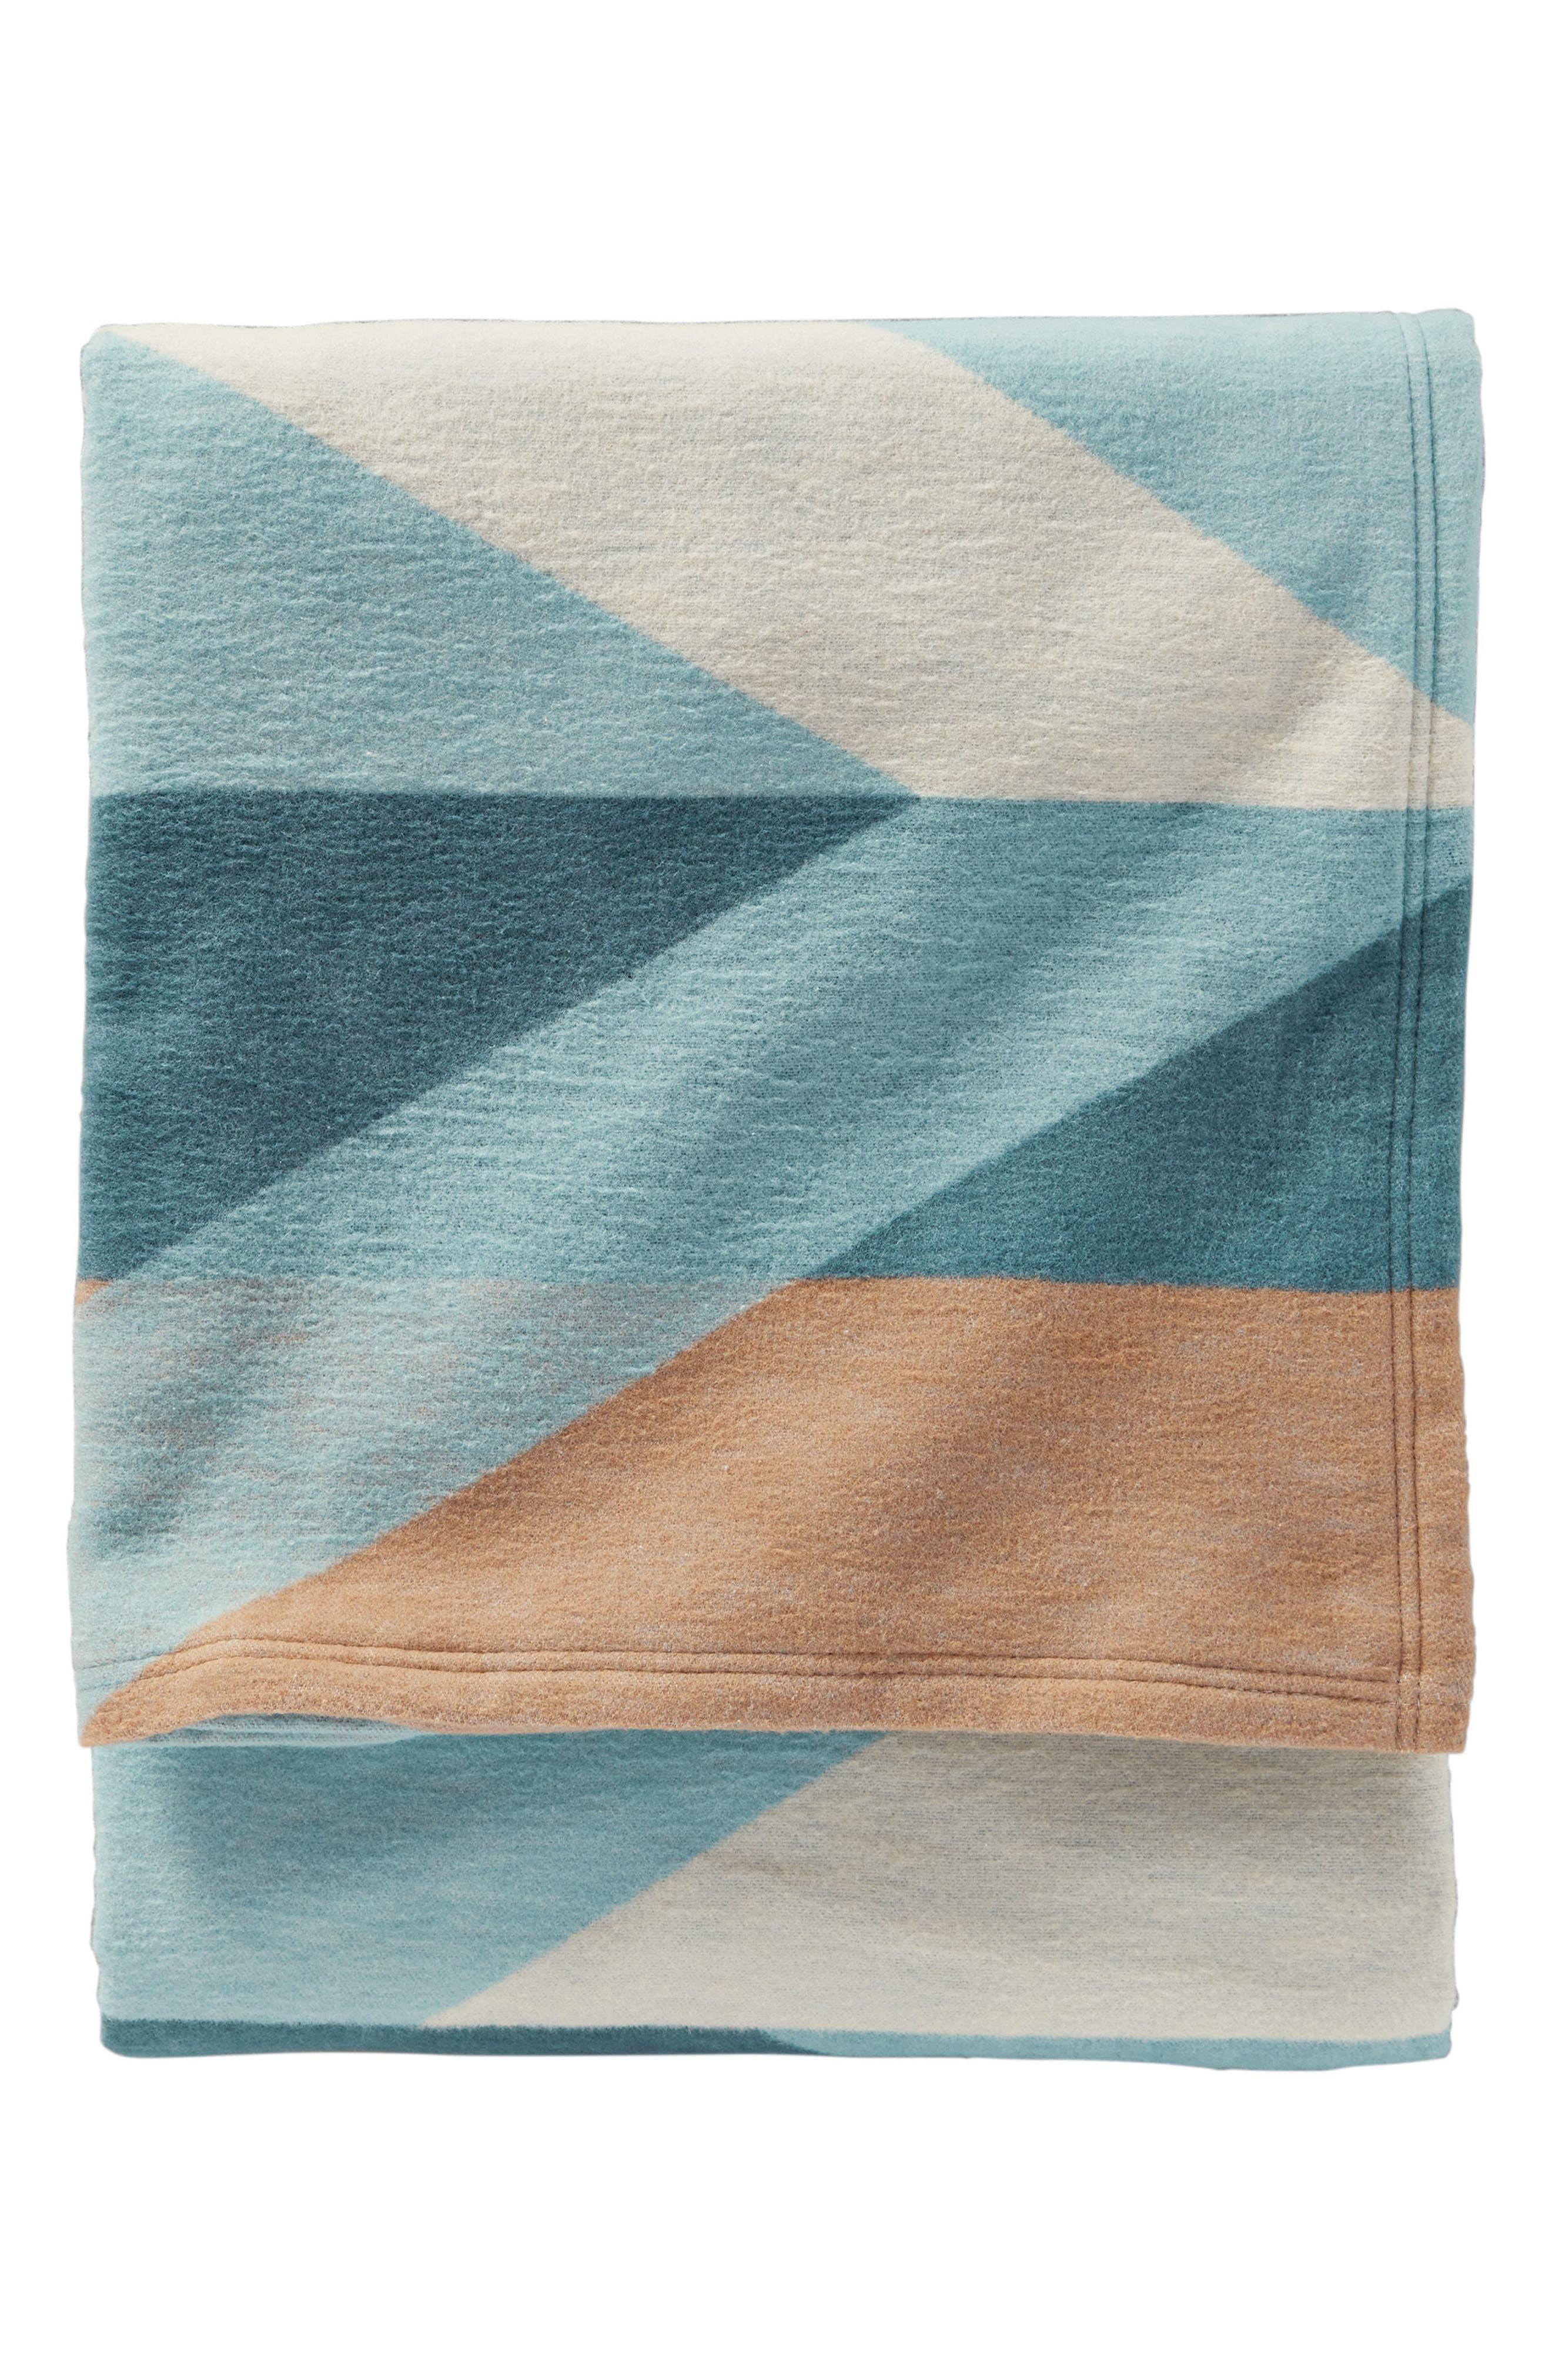 Alternate Image 1 Selected - Pendleton Pima Canyon Throw Blanket